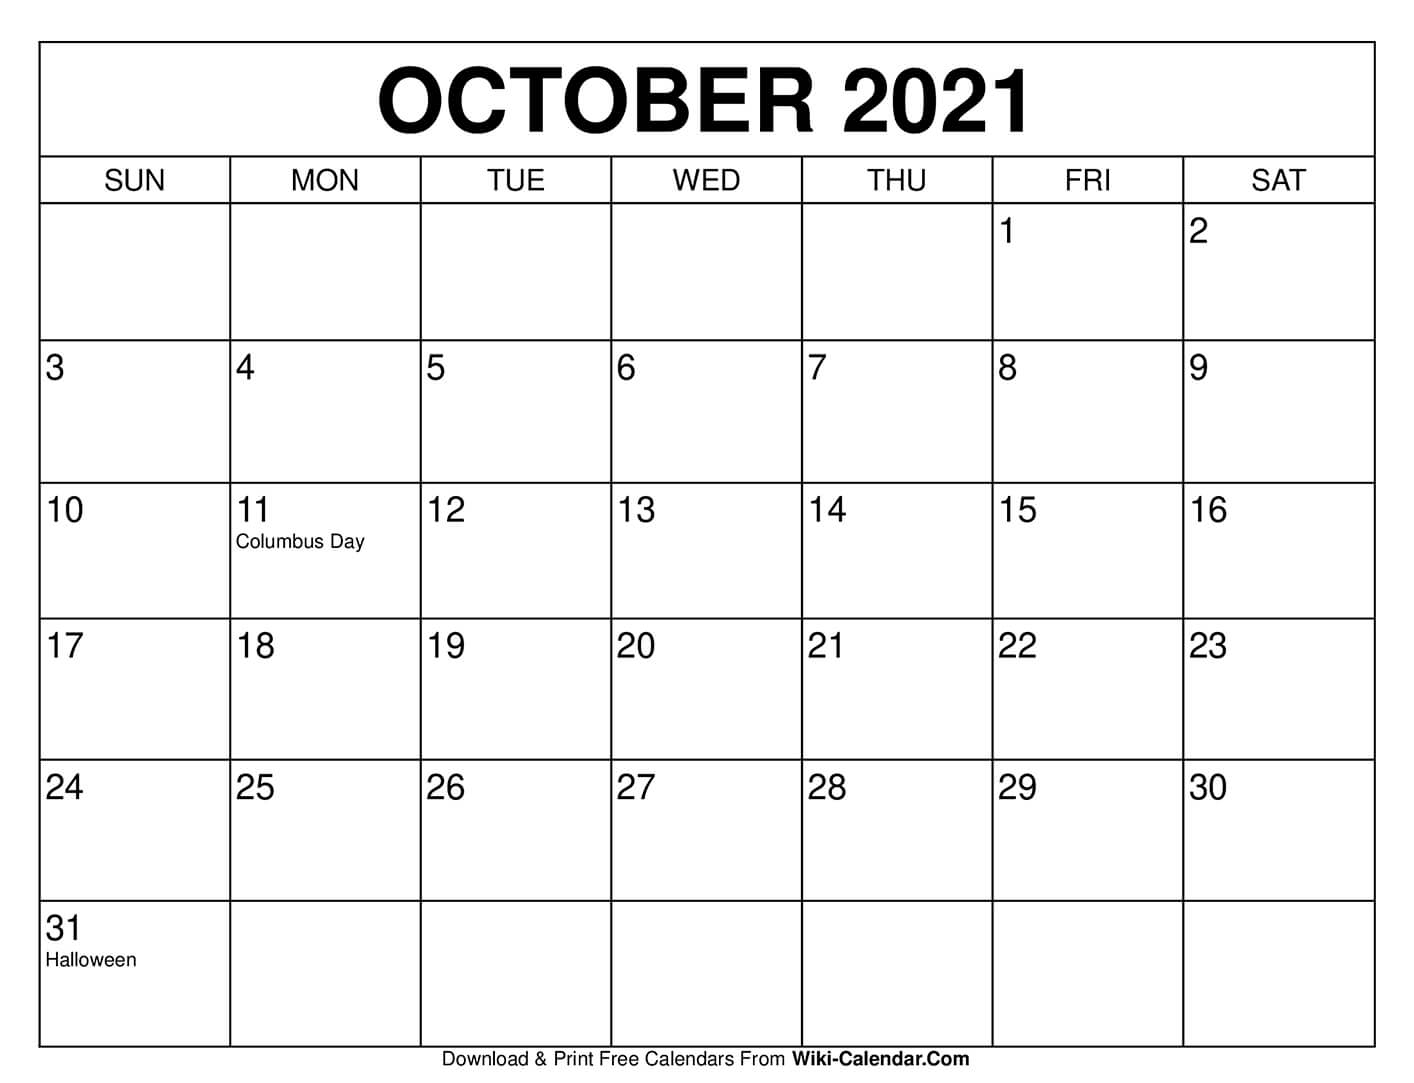 Free Printable October 2021 Calendars